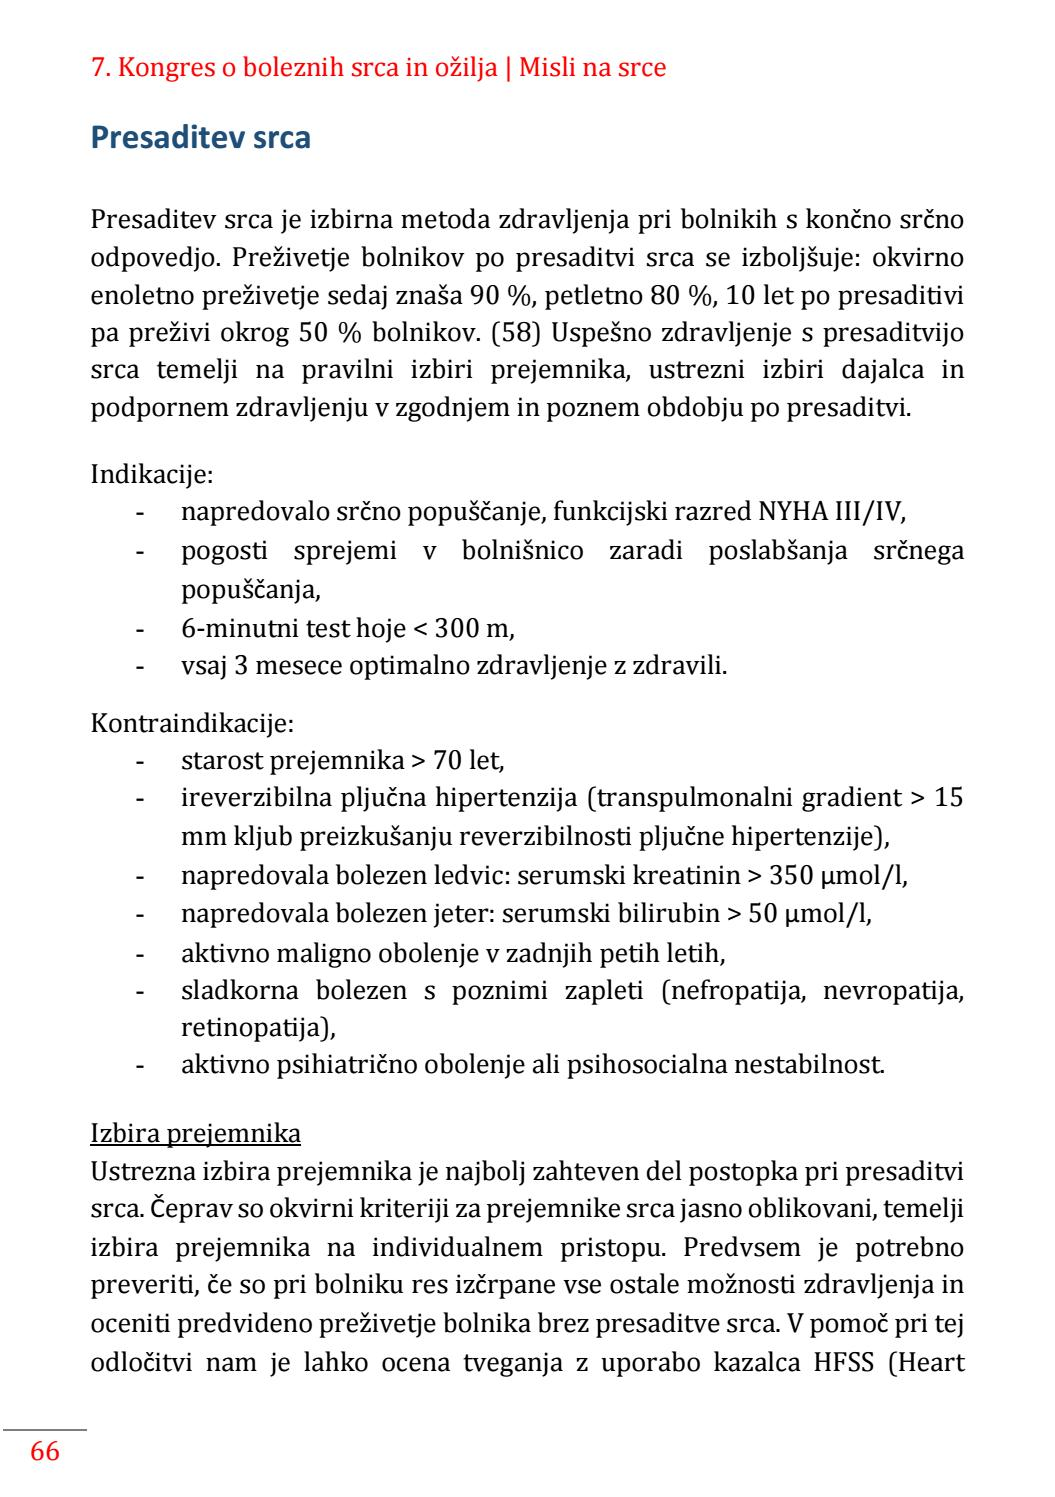 kreatinin, hipertenzija)